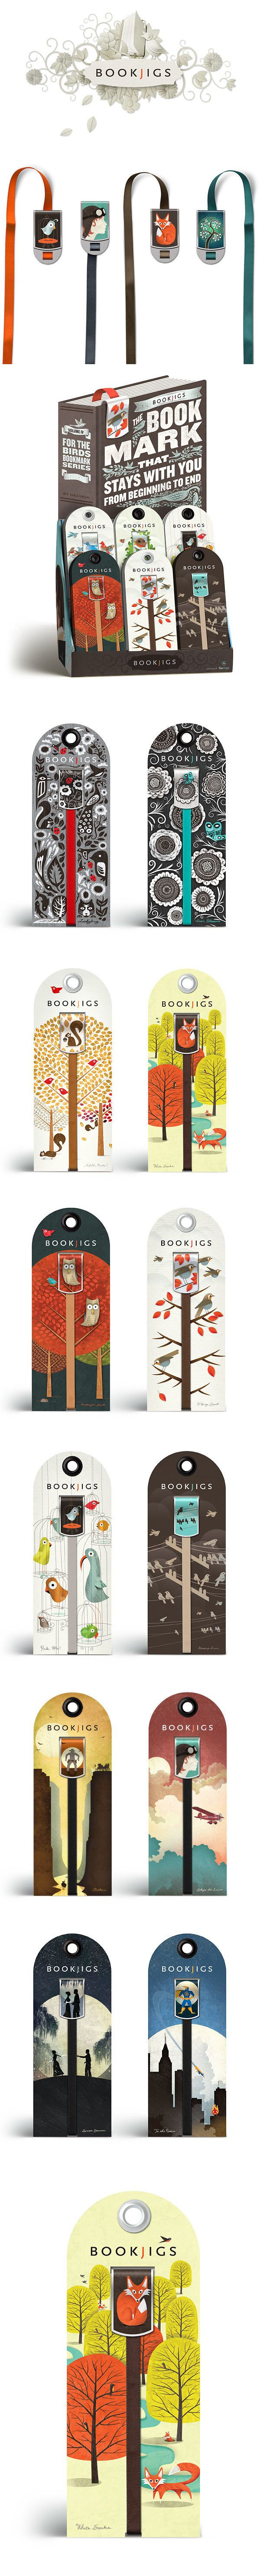 Bookjigs Initial #Branding & #Packaging. By: Russ Grey